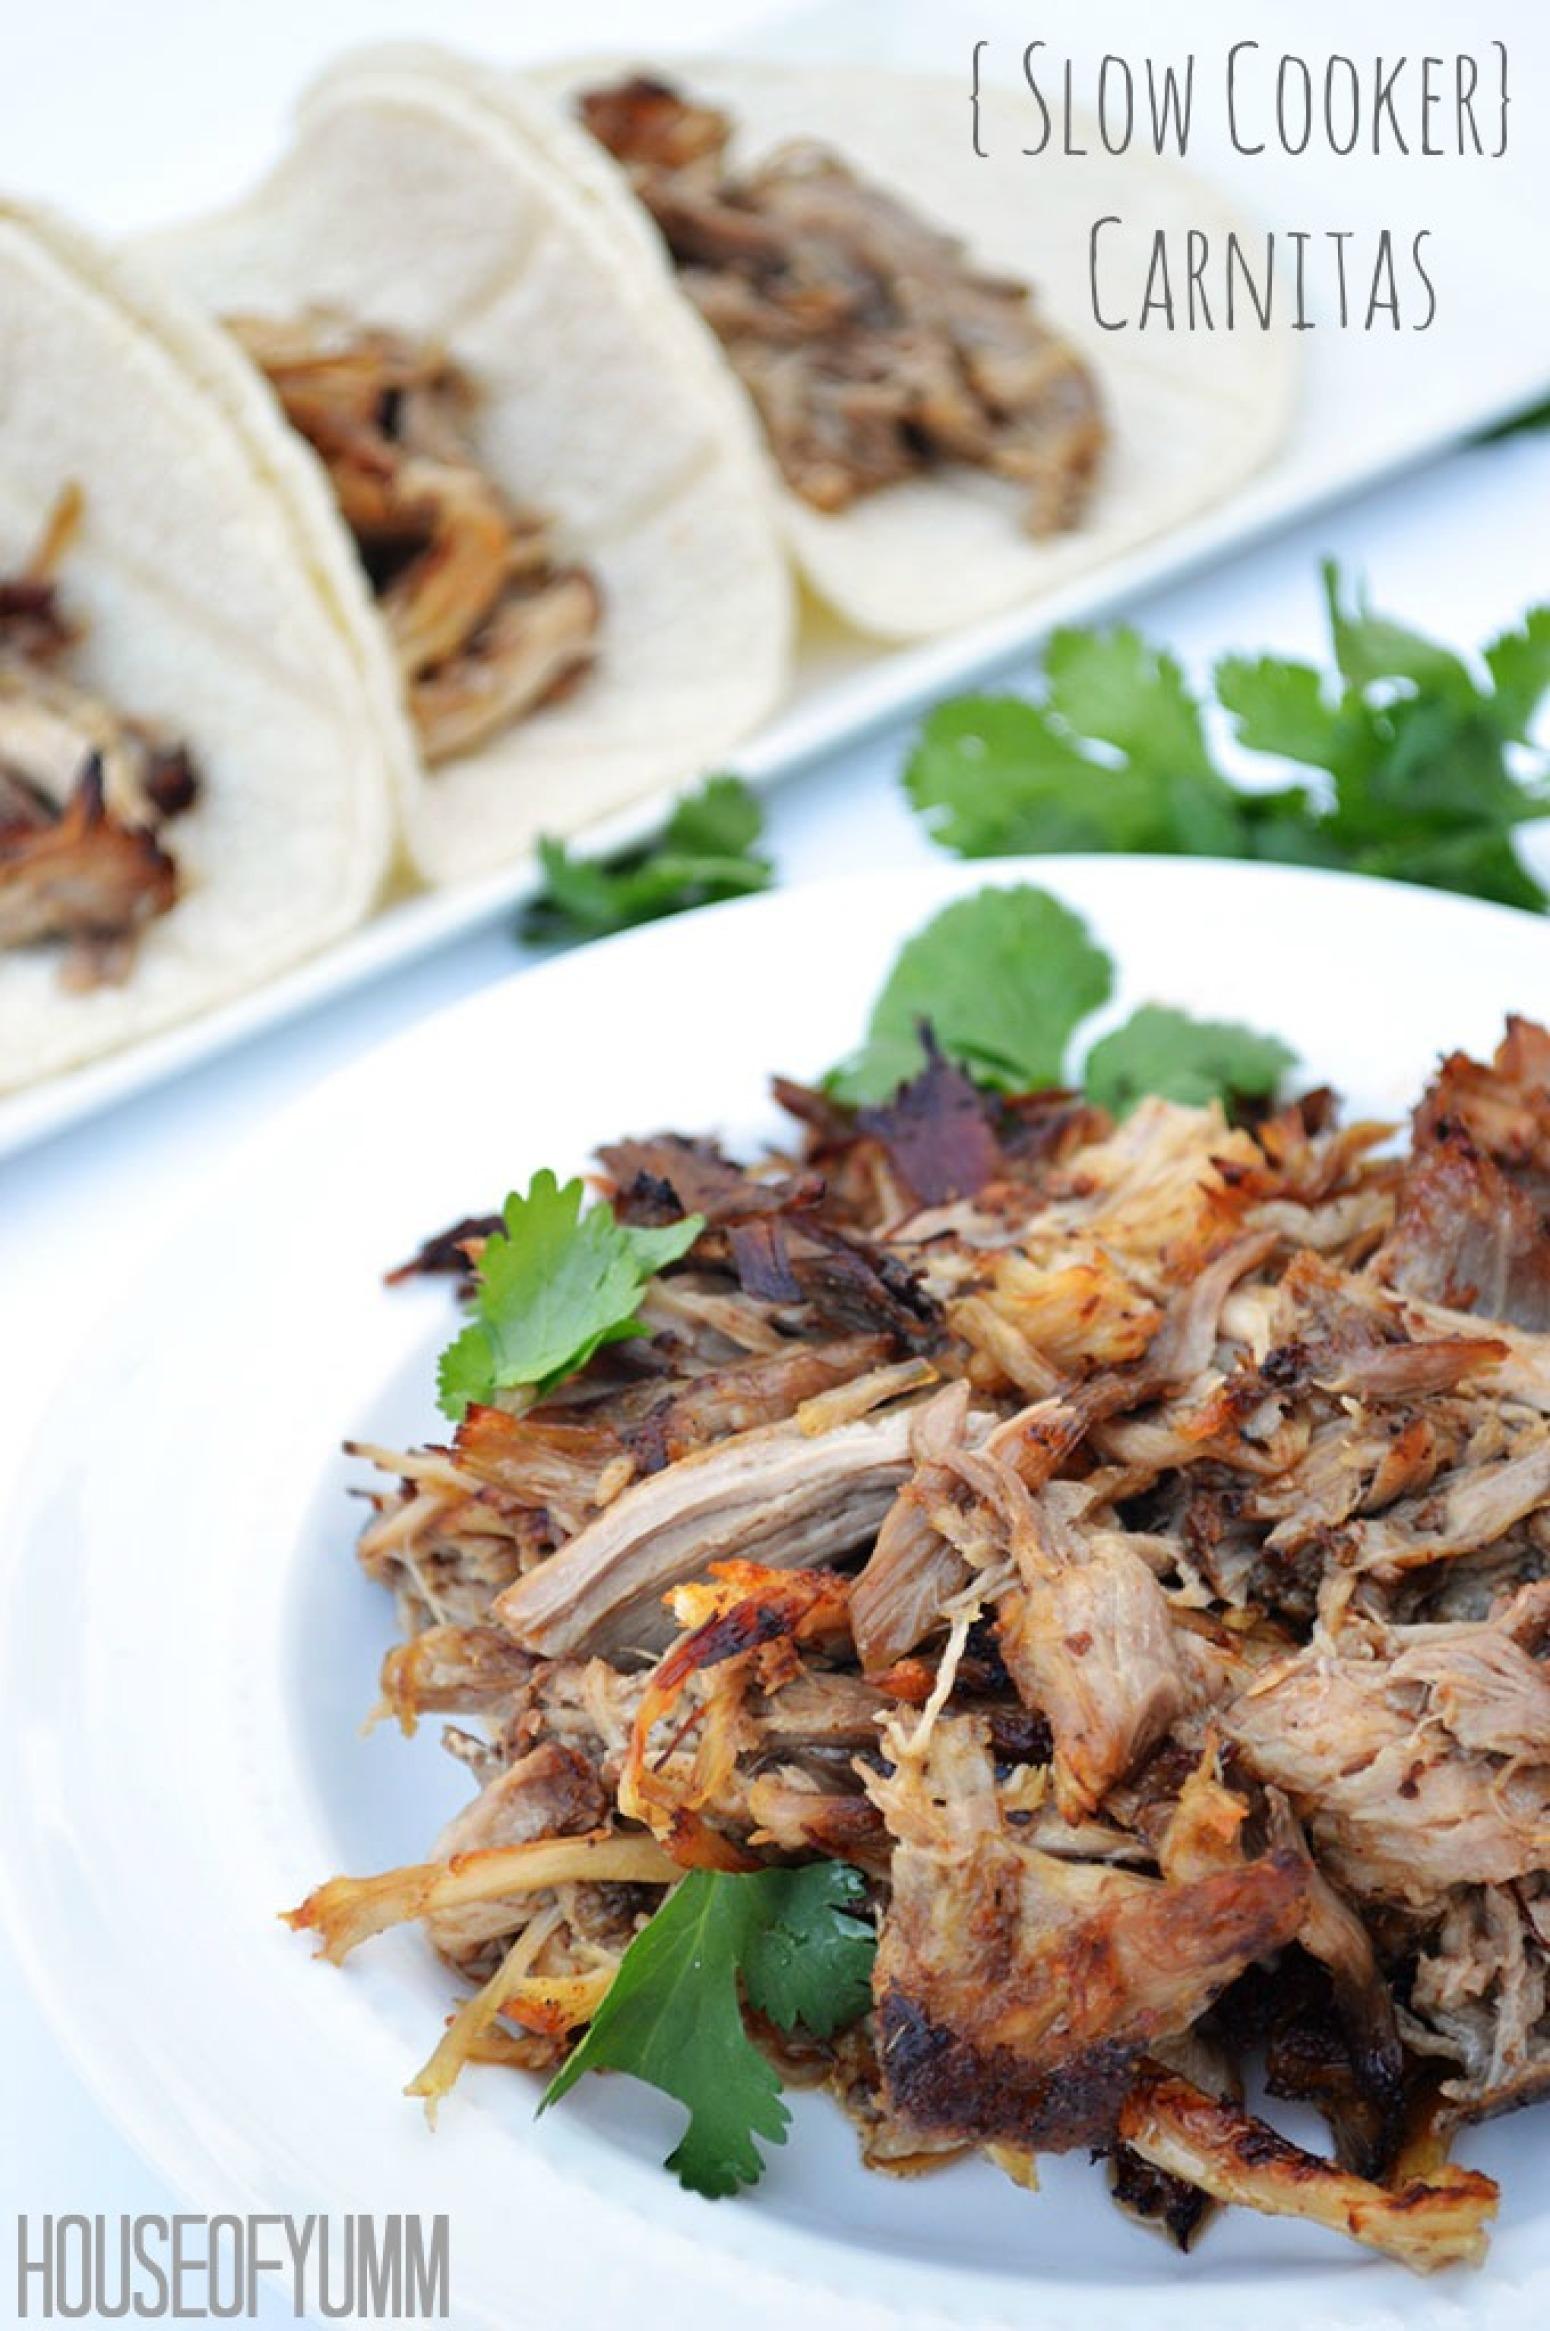 Slow Cooker} Carnitas Recipe 9 | Just A Pinch Recipes